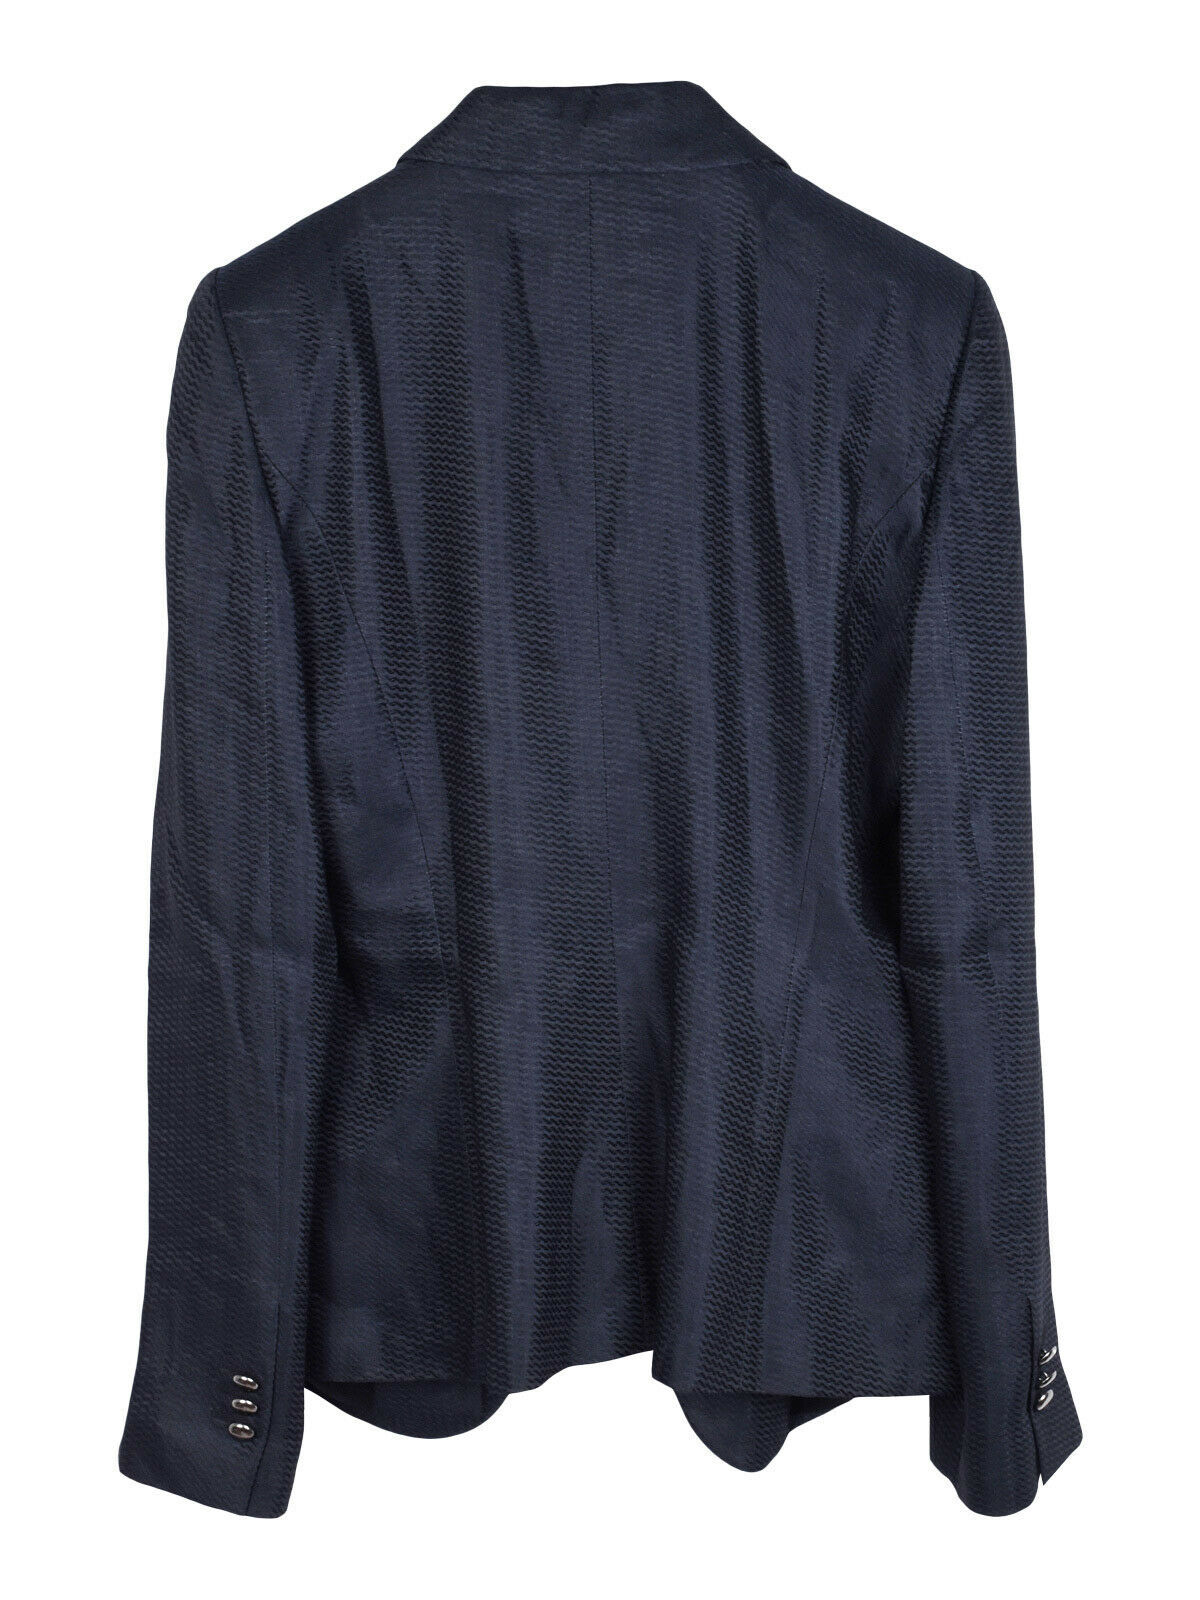 Giorgio Armani silk blend single breasted jacket